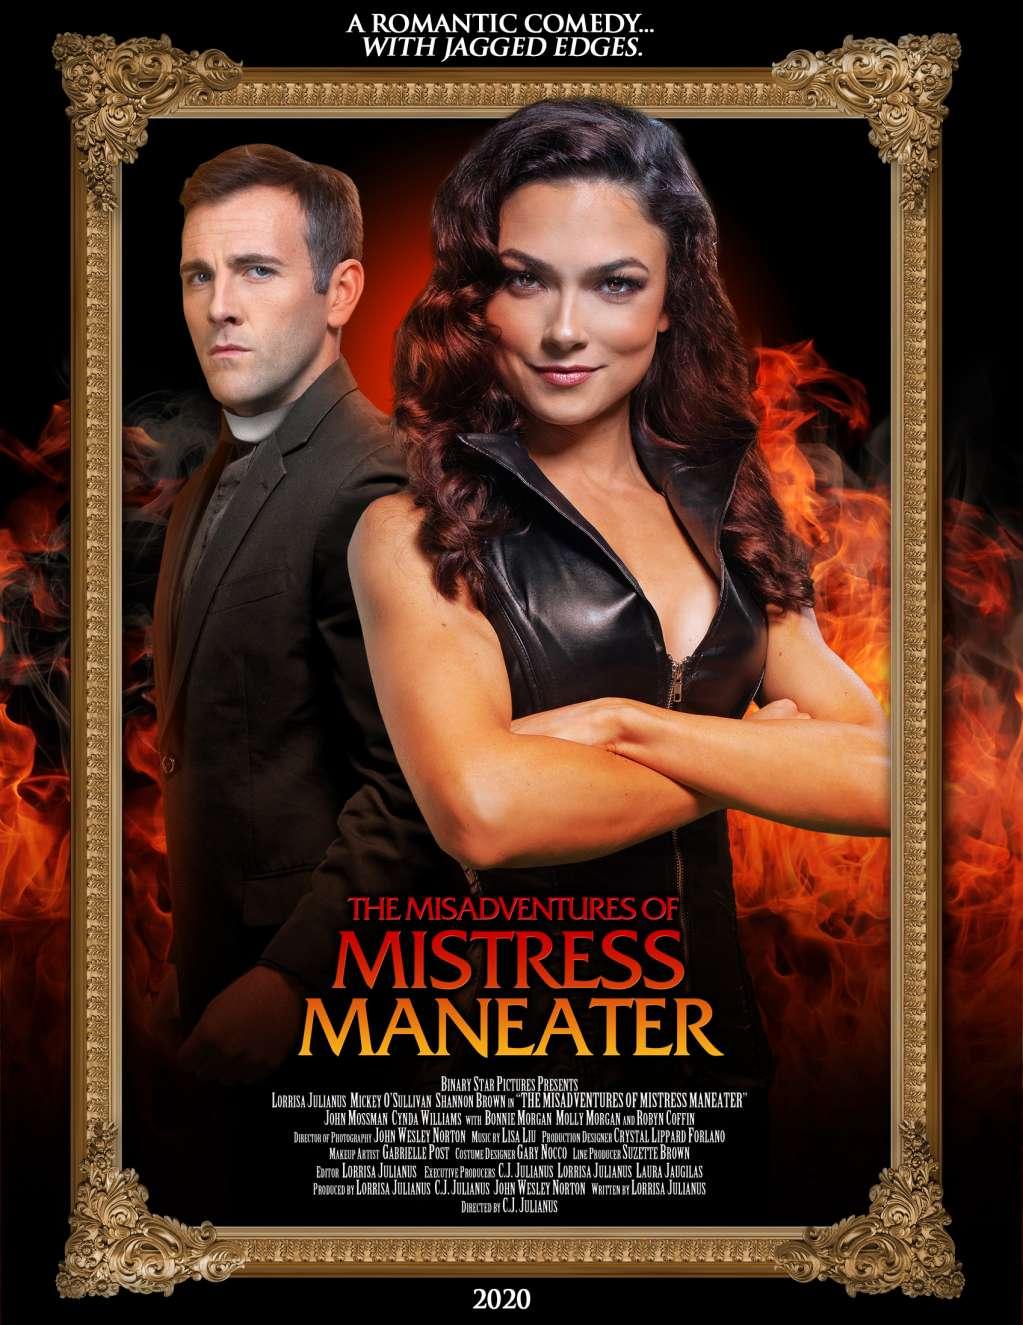 The Misadventures of Mistress Maneater kapak